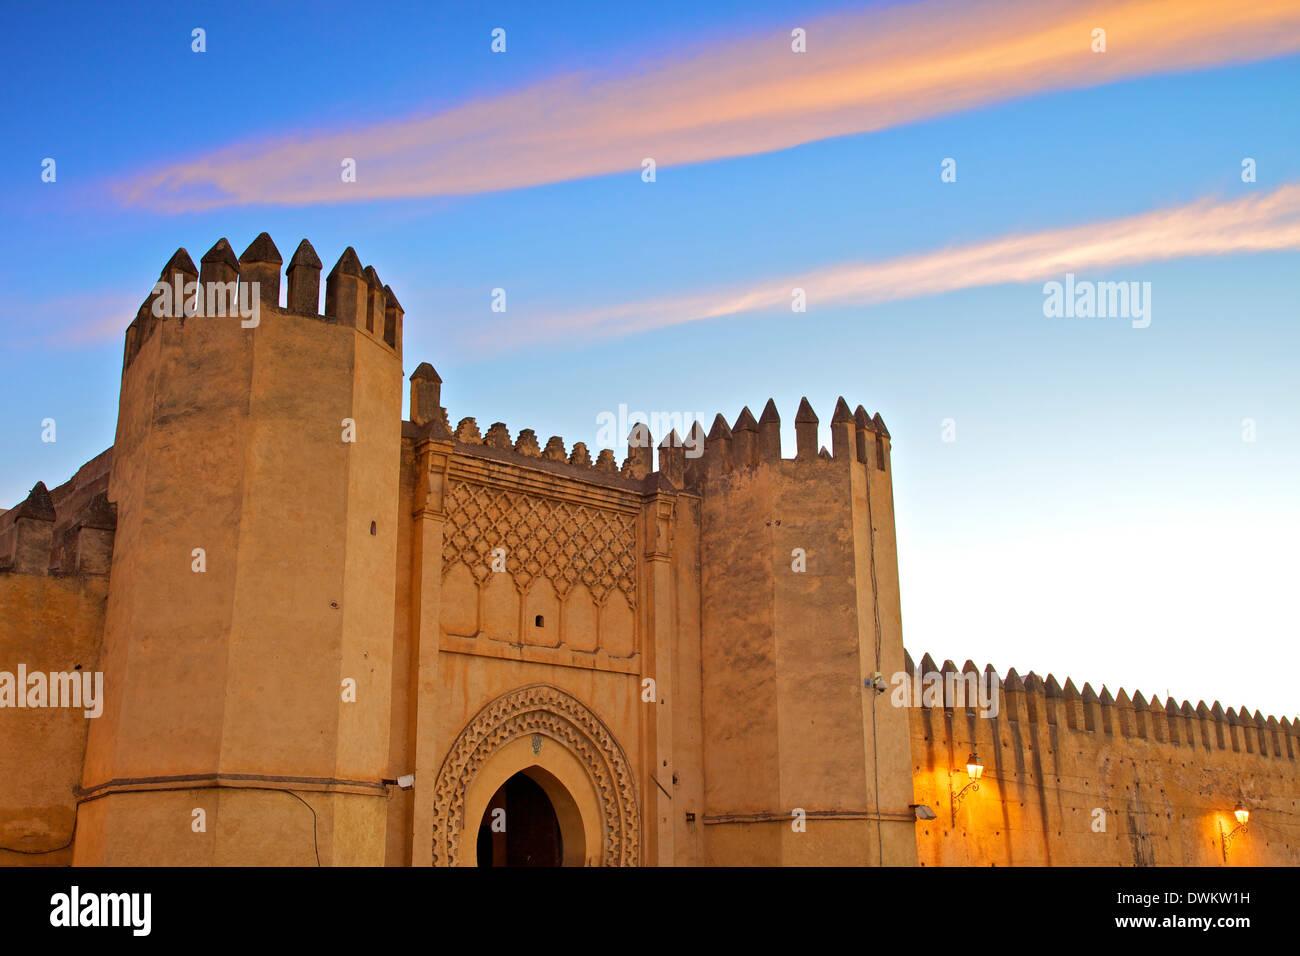 Platzieren Sie Bou Jeloud, Fez, Marokko, Nordafrika, Afrika Stockbild